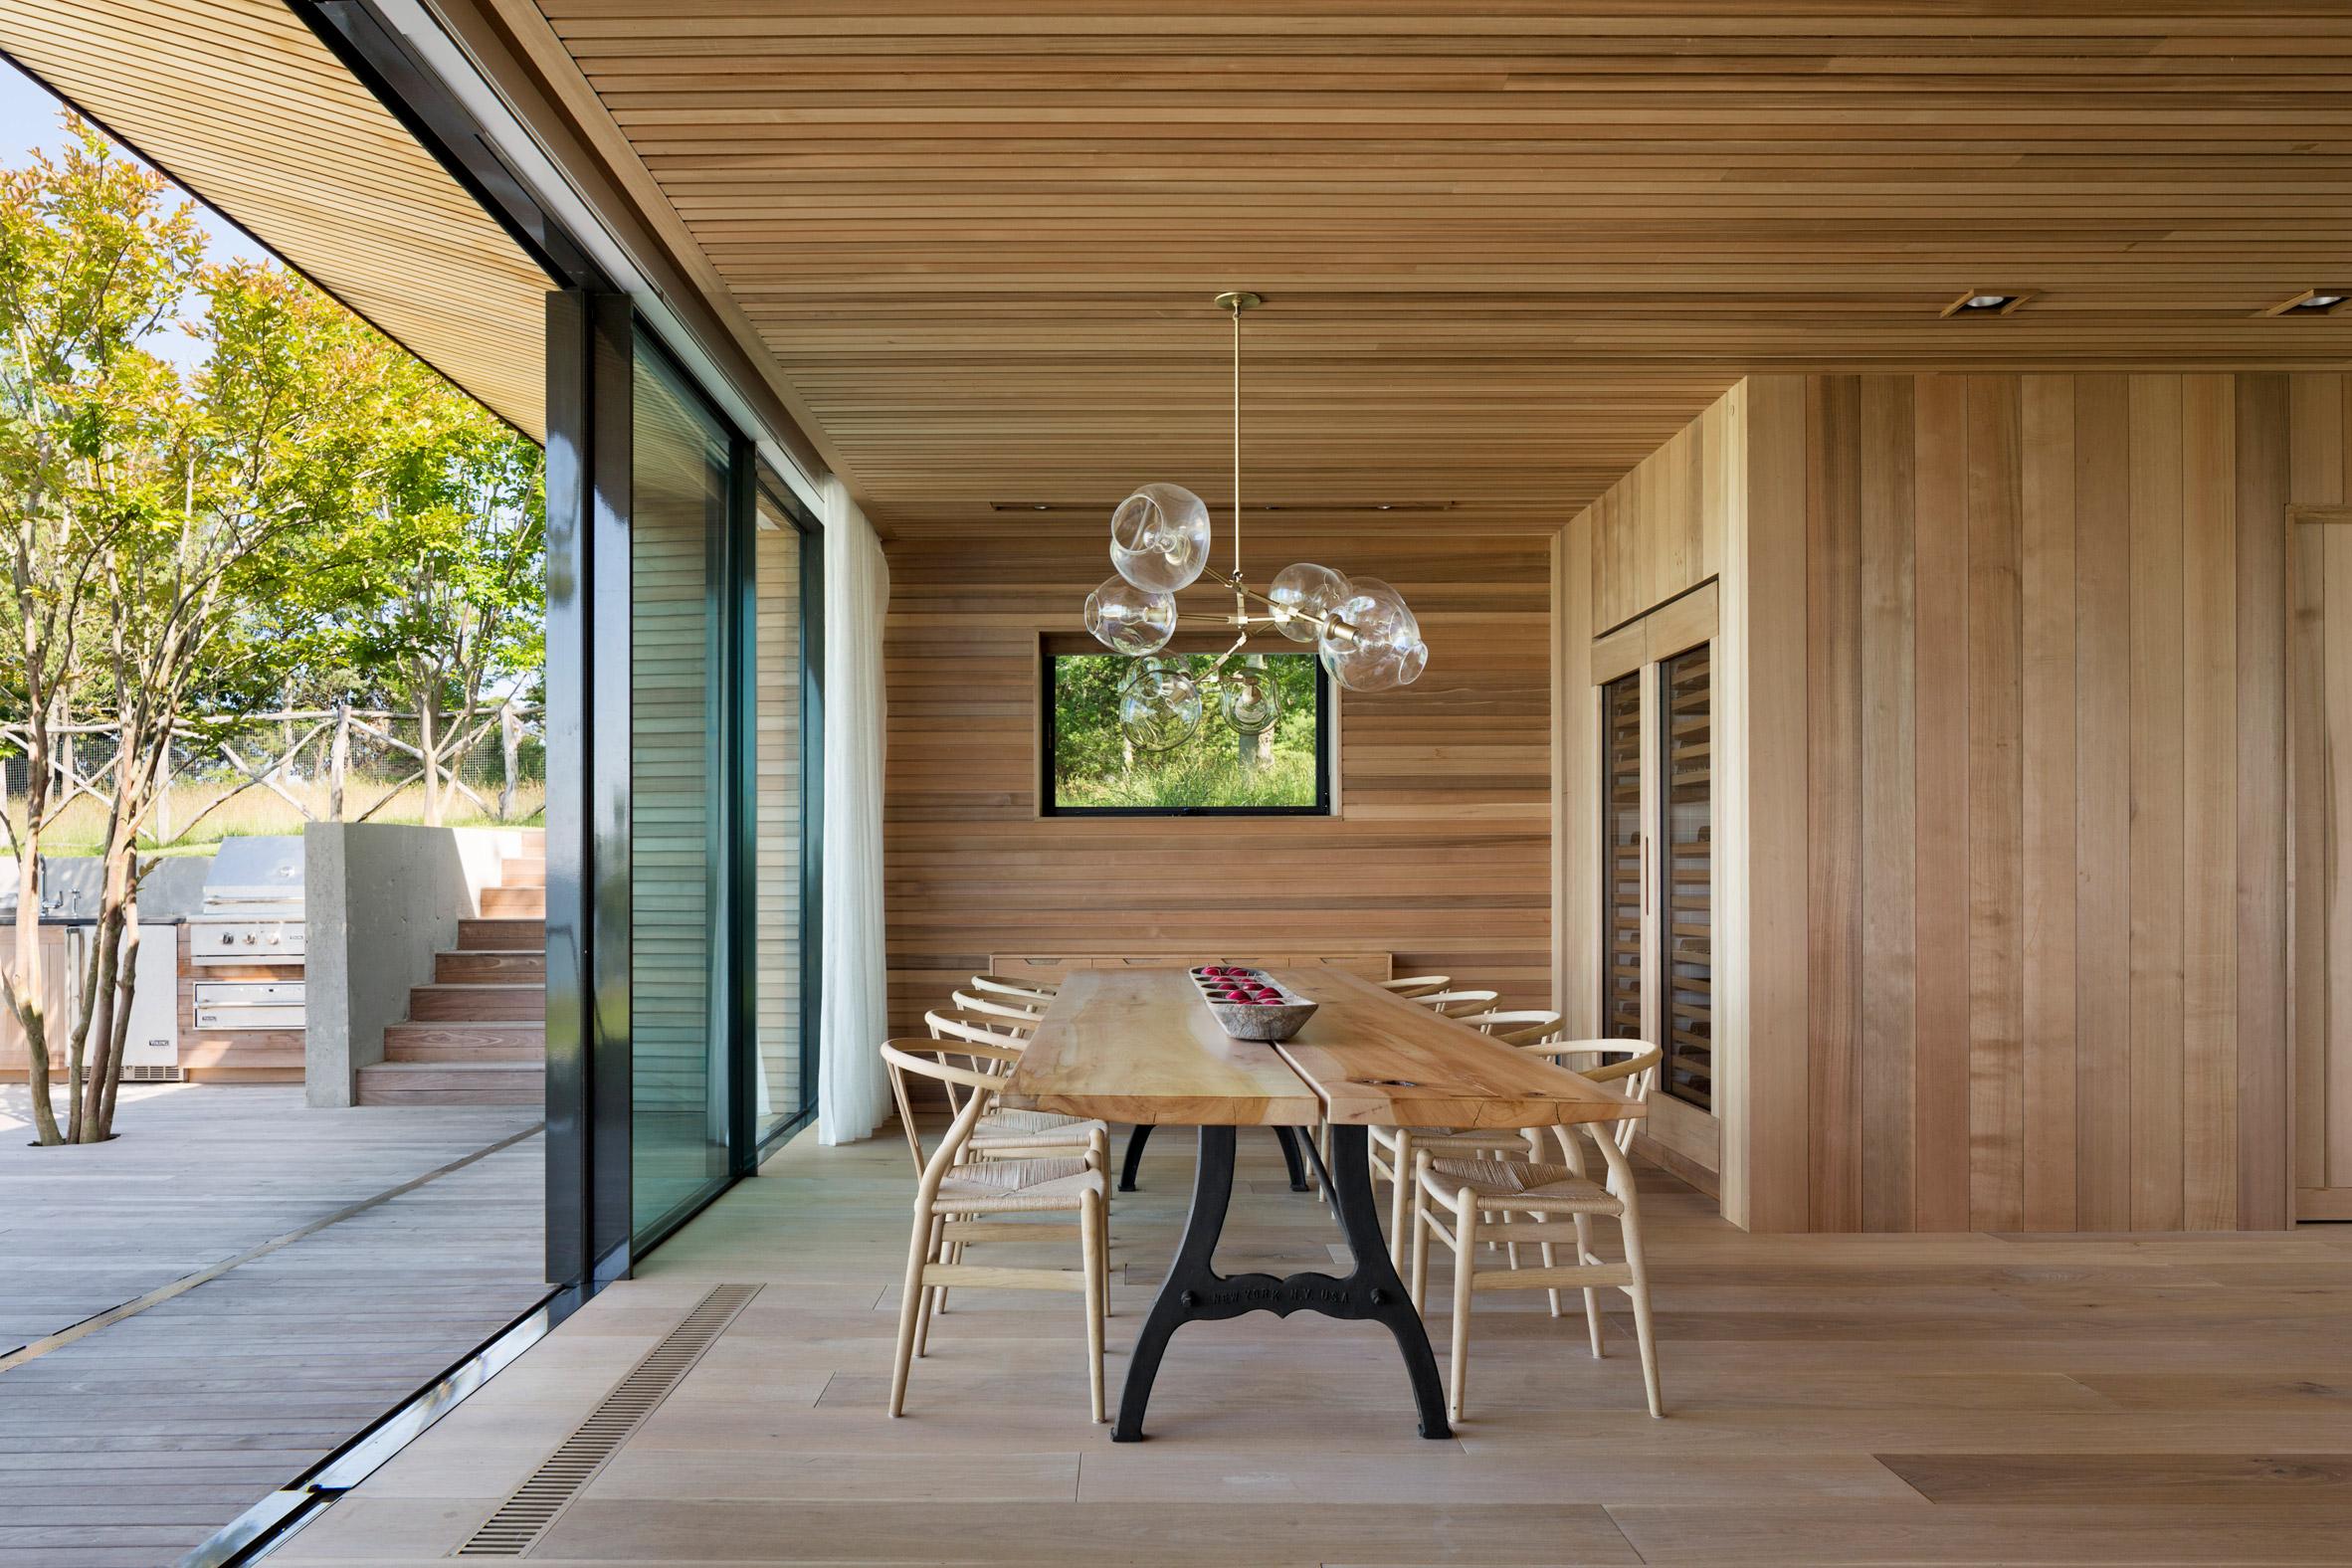 peconic-house-mapos-studio-hamptons-long-island-new-york_dezeen_2364_col_22.jpg